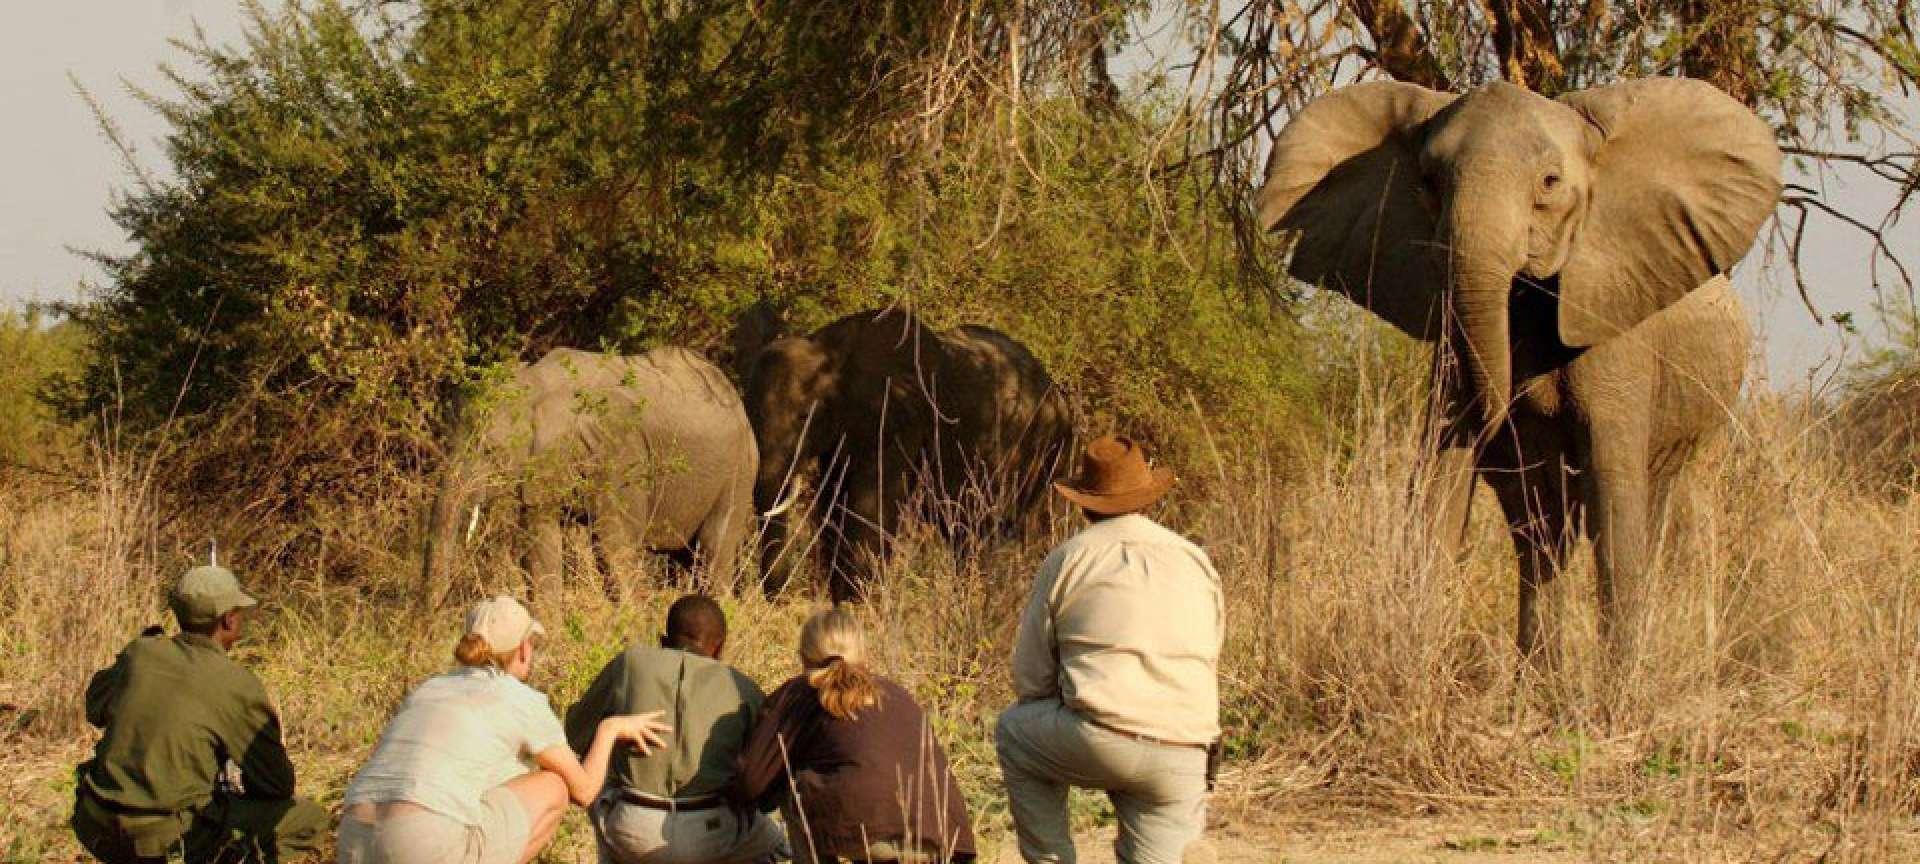 Walking safaris in the Kruger National Park - Africa Wildlife Safaris